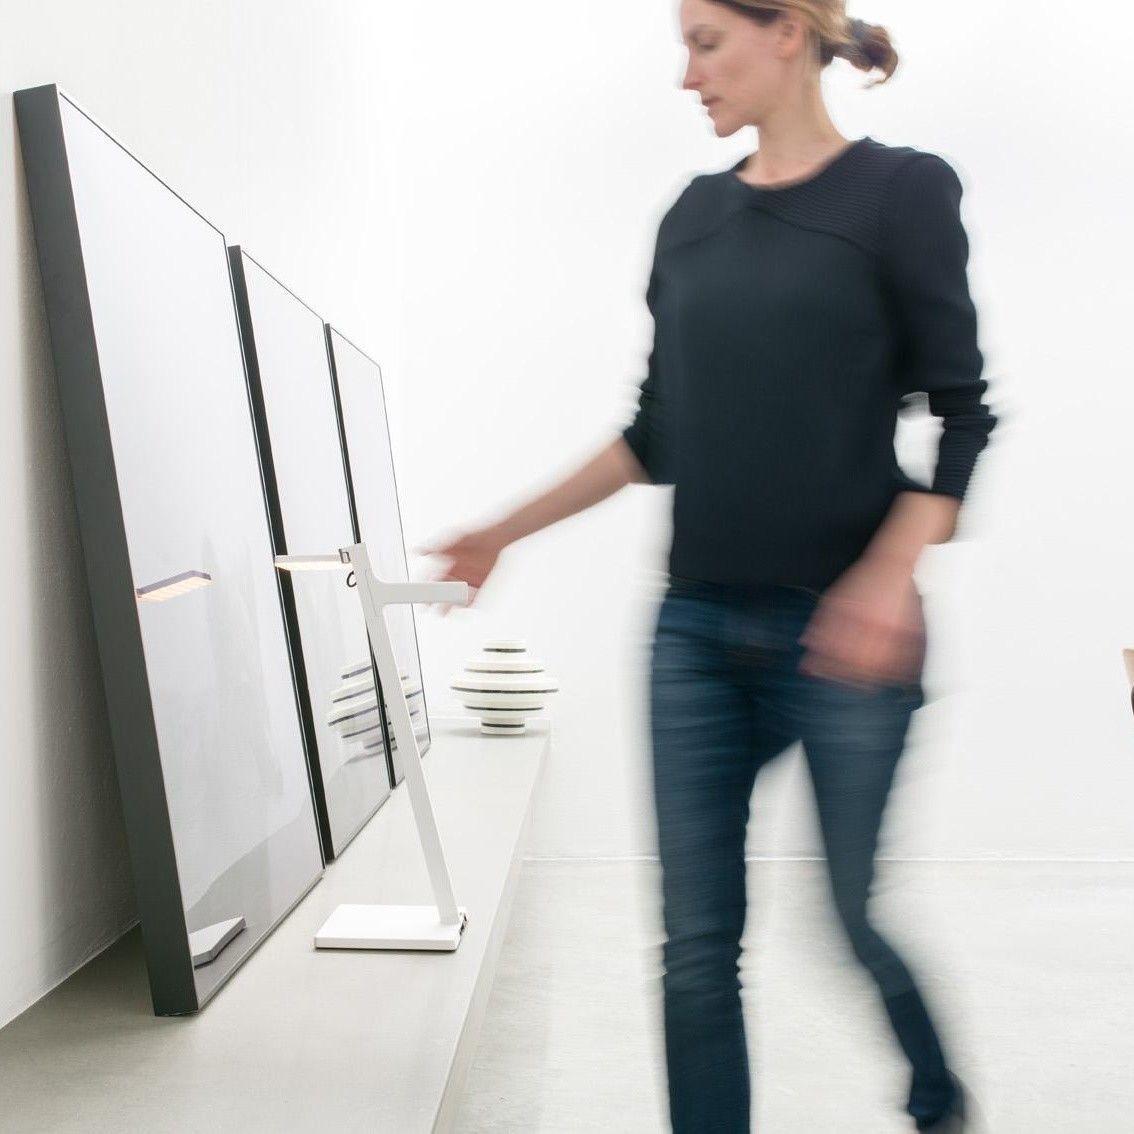 roxxane leggera cl 52 led tafellamp nimbus. Black Bedroom Furniture Sets. Home Design Ideas